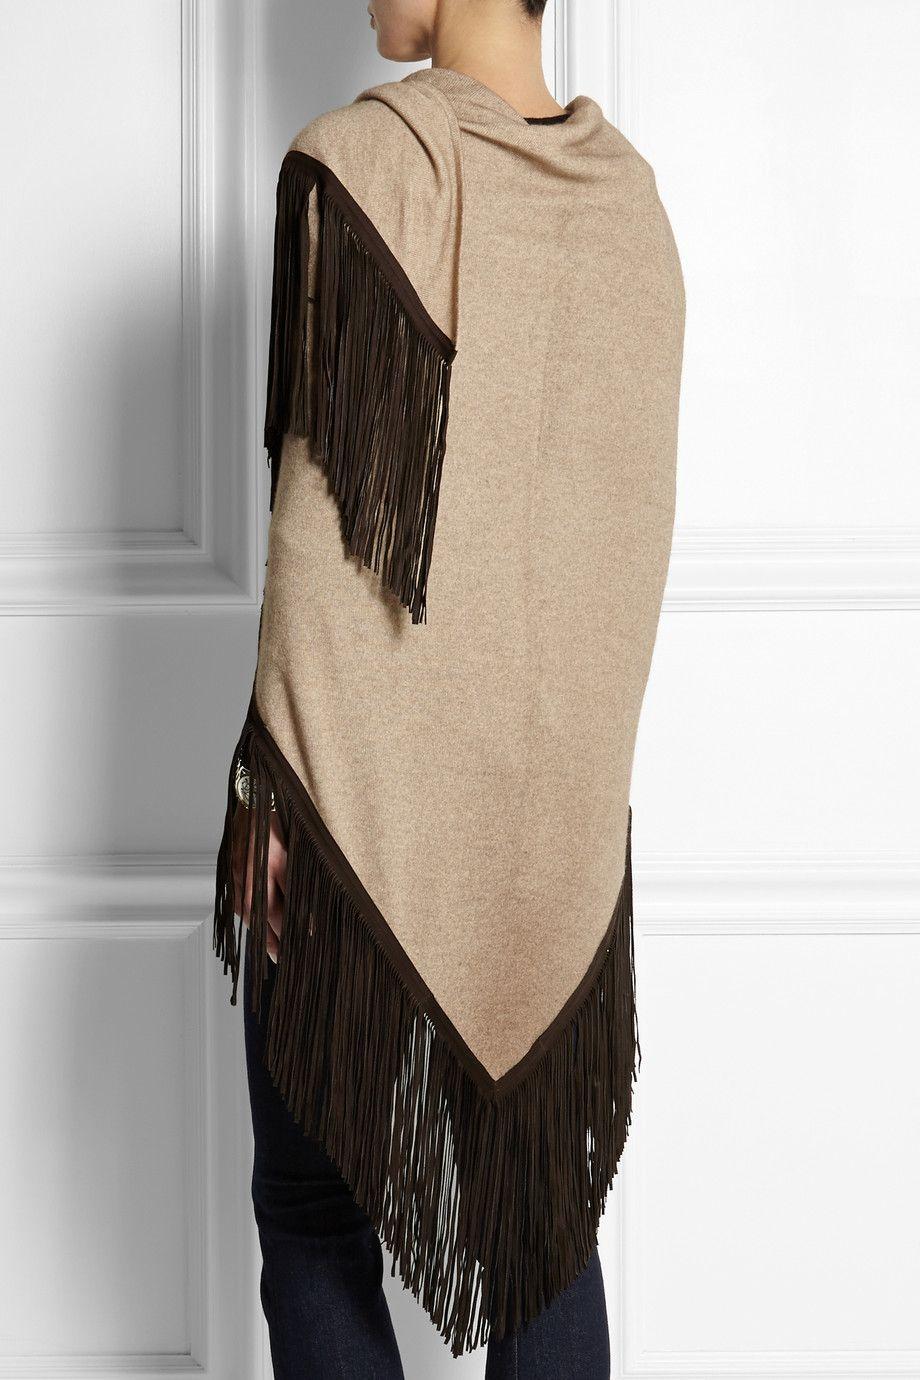 Finds Barbajada leather-fringed cashmere shawl